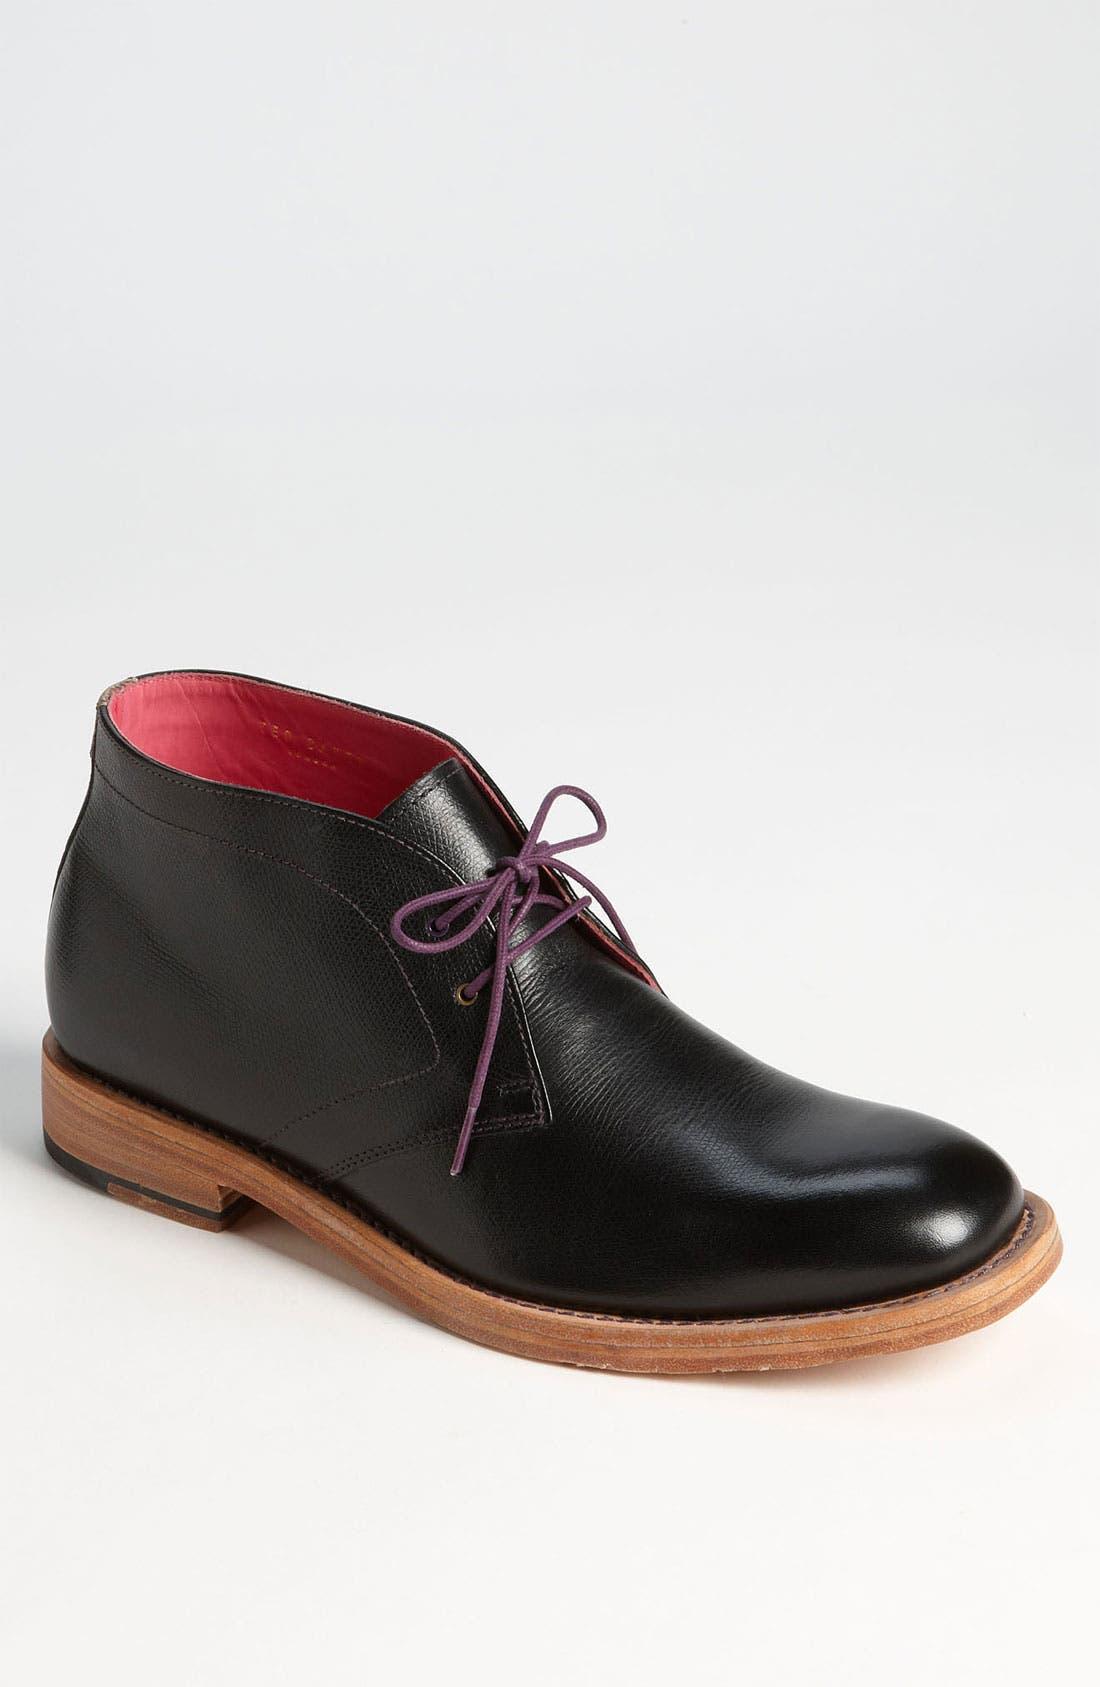 Alternate Image 1 Selected - Ted Baker London 'Masou' Chukka Boot